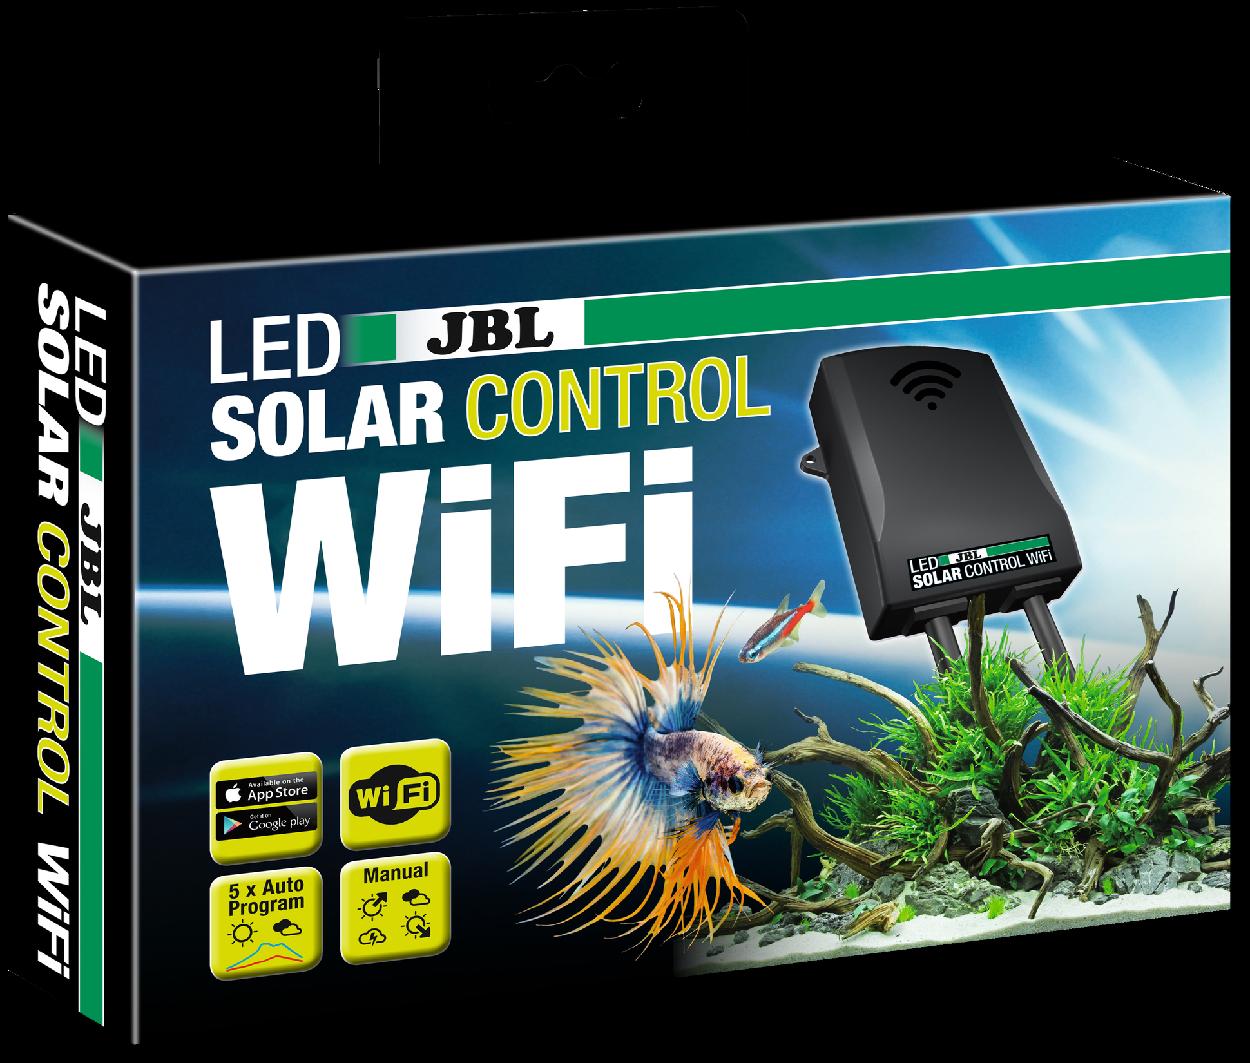 JBL LED Solar Control